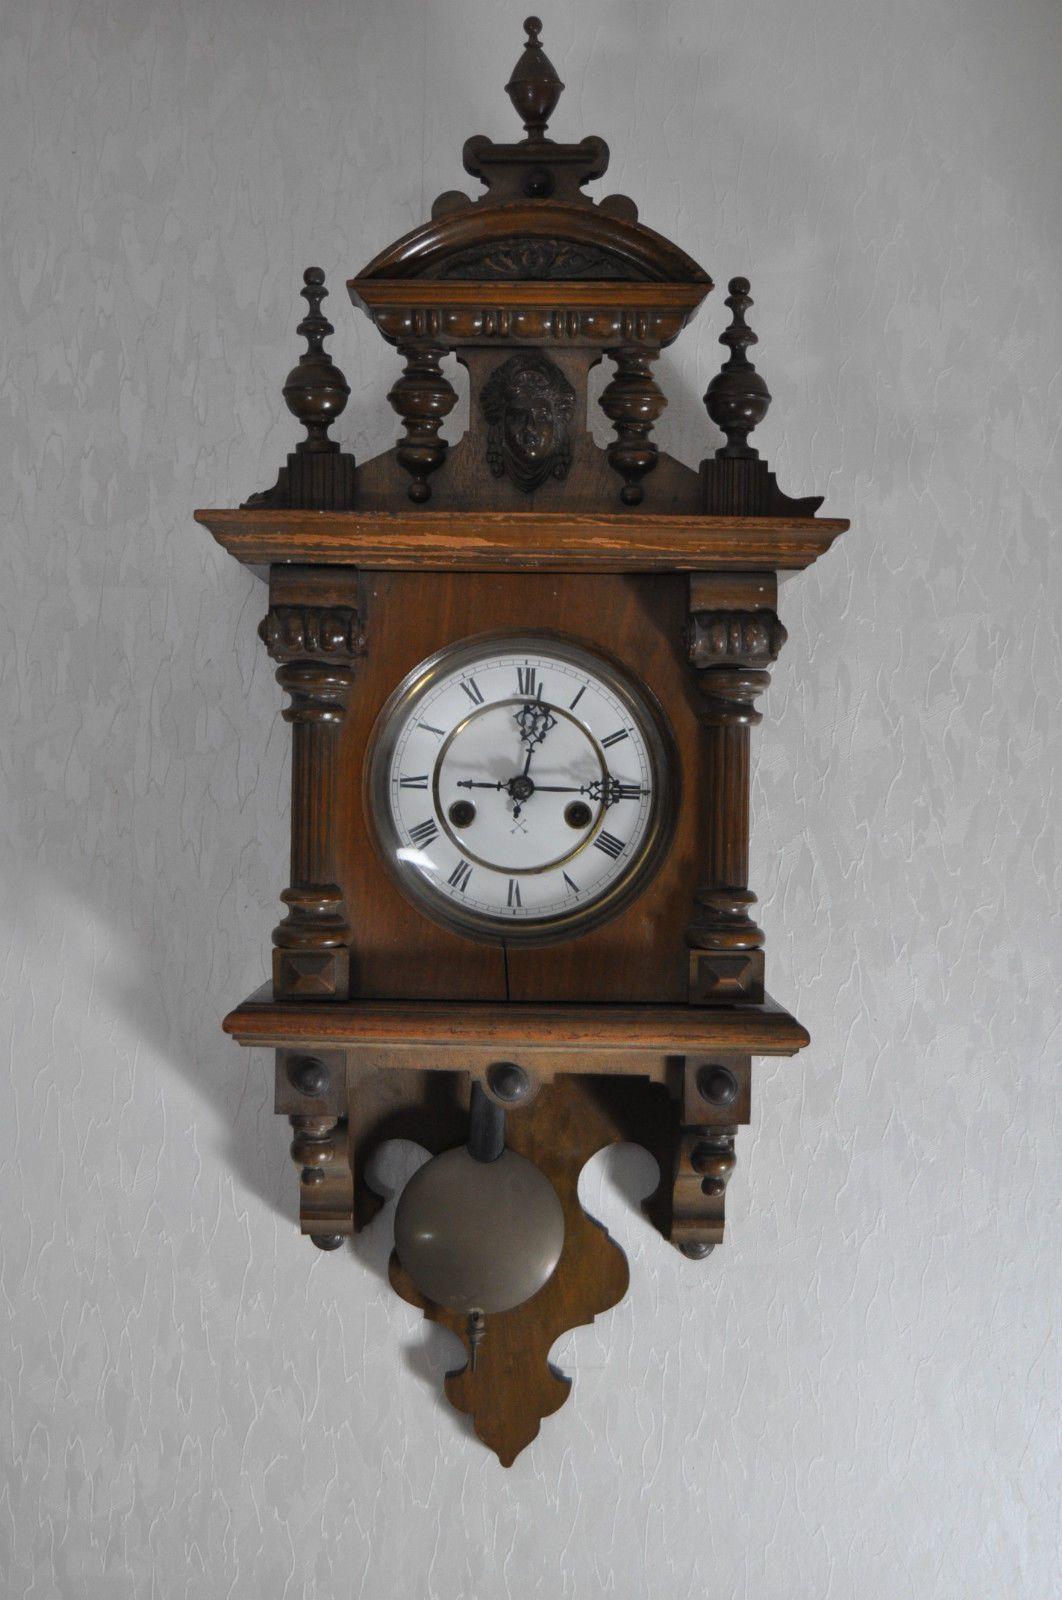 Wanduhr Pendeluhr Regulator Gründerzeit Historismus Kreuzpfeil Antik Ebay Pendeluhr Wanduhr Antike Uhren